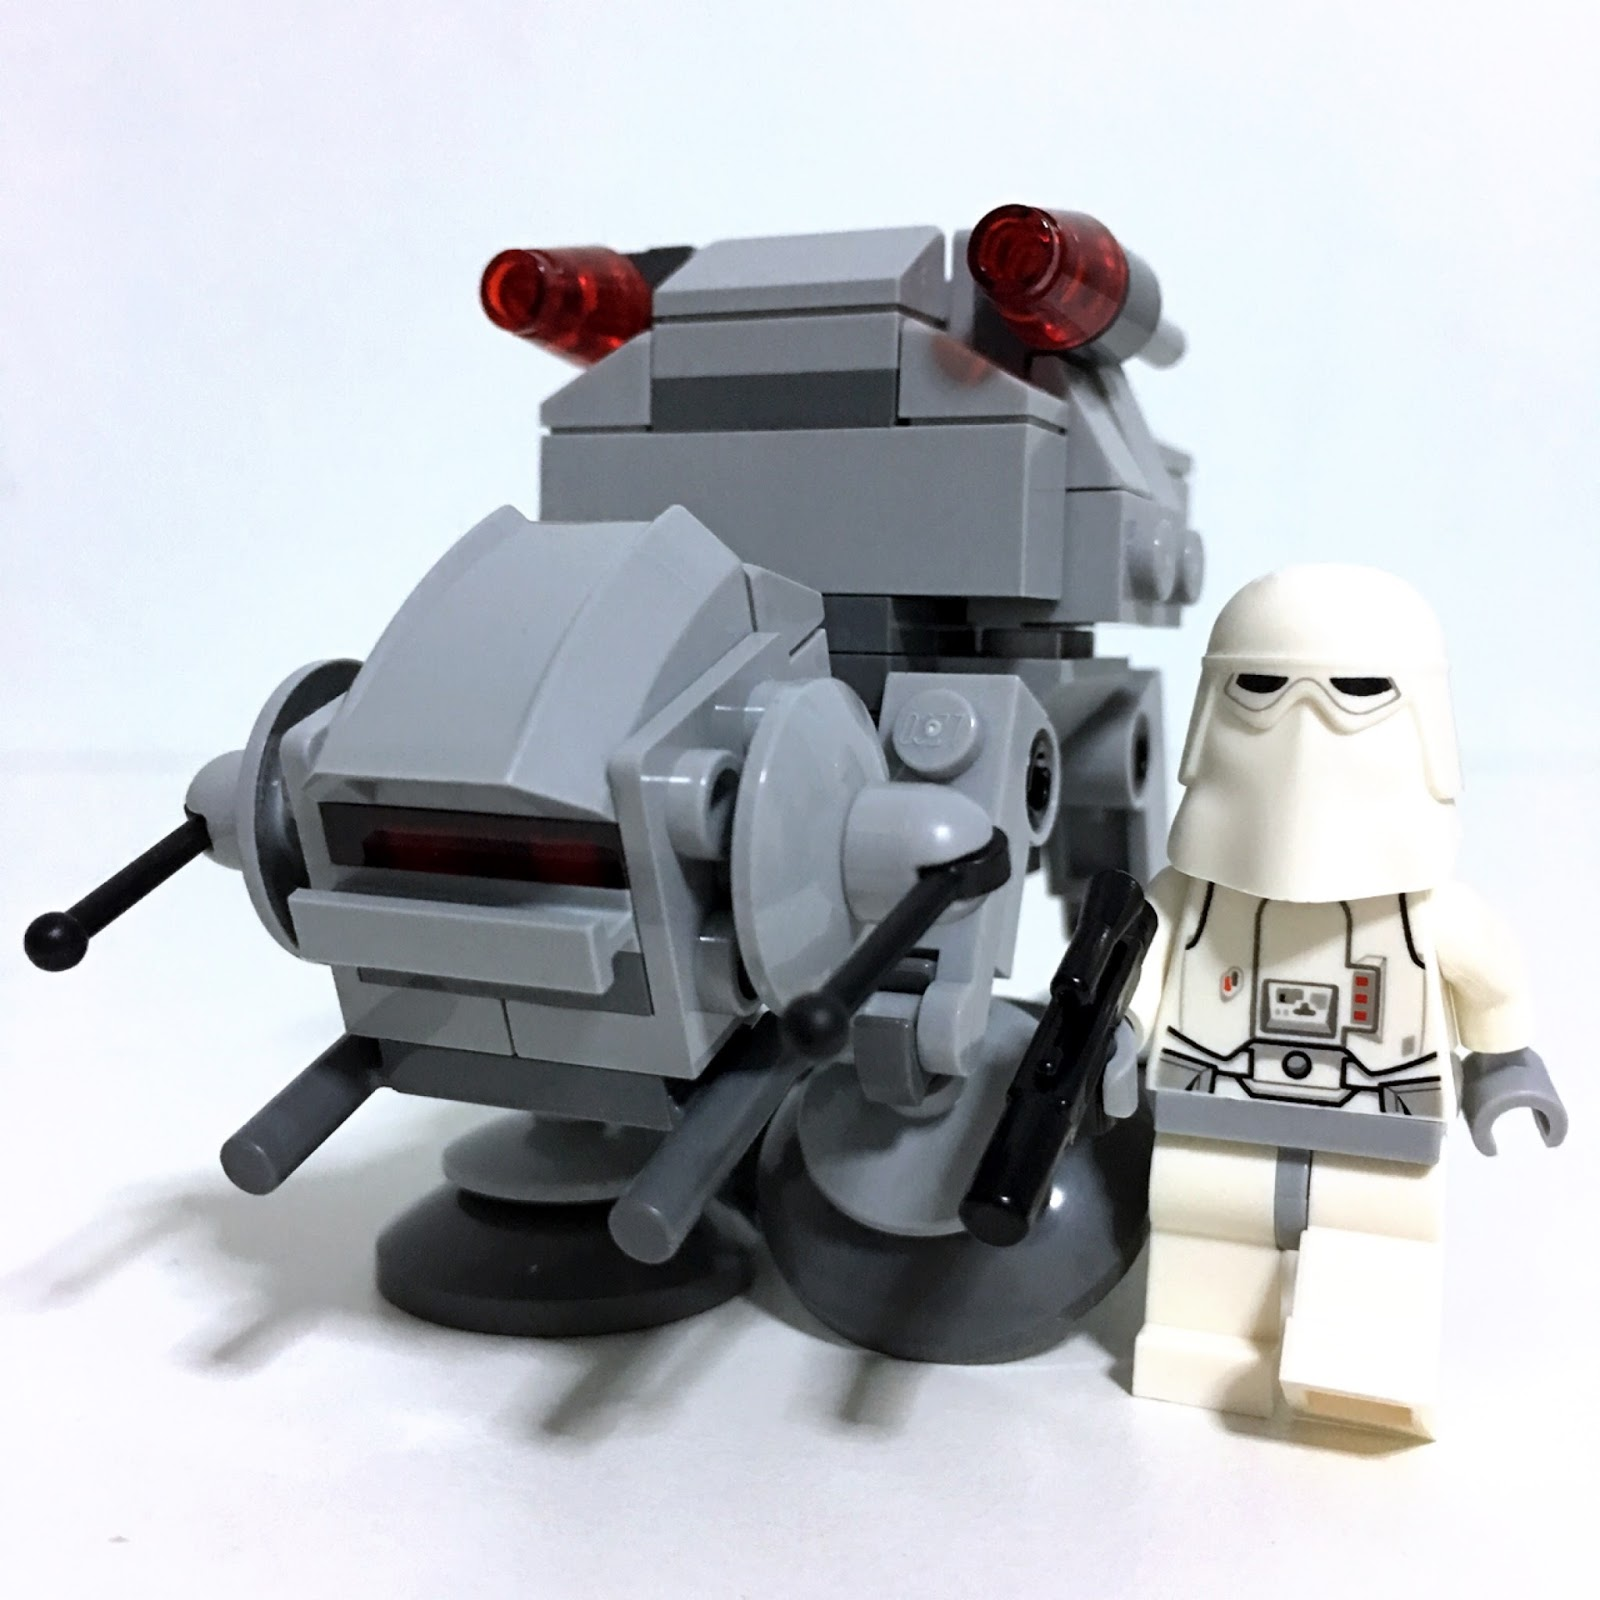 Jabba/'s Palace New Lego 75146 Star Wars Advent Calendar 2016 Day 18